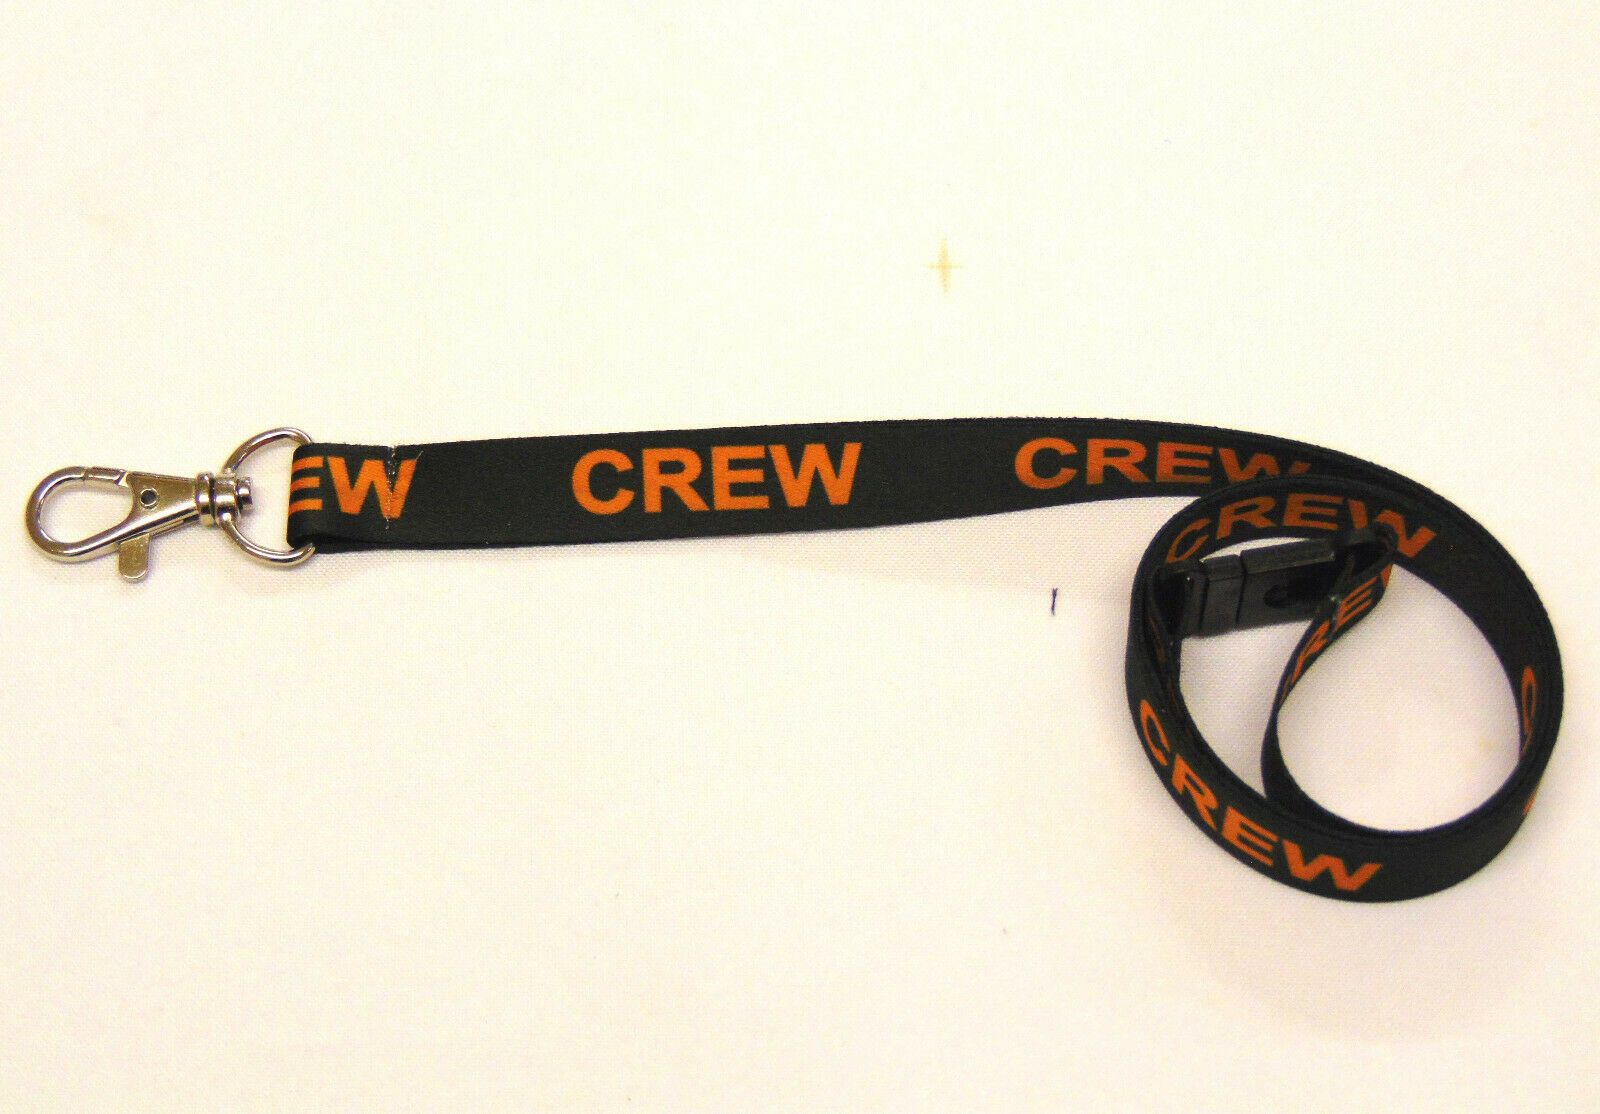 CREW lanyard black/orange 15mm with safety breakaway for ID & keys. Free UK post